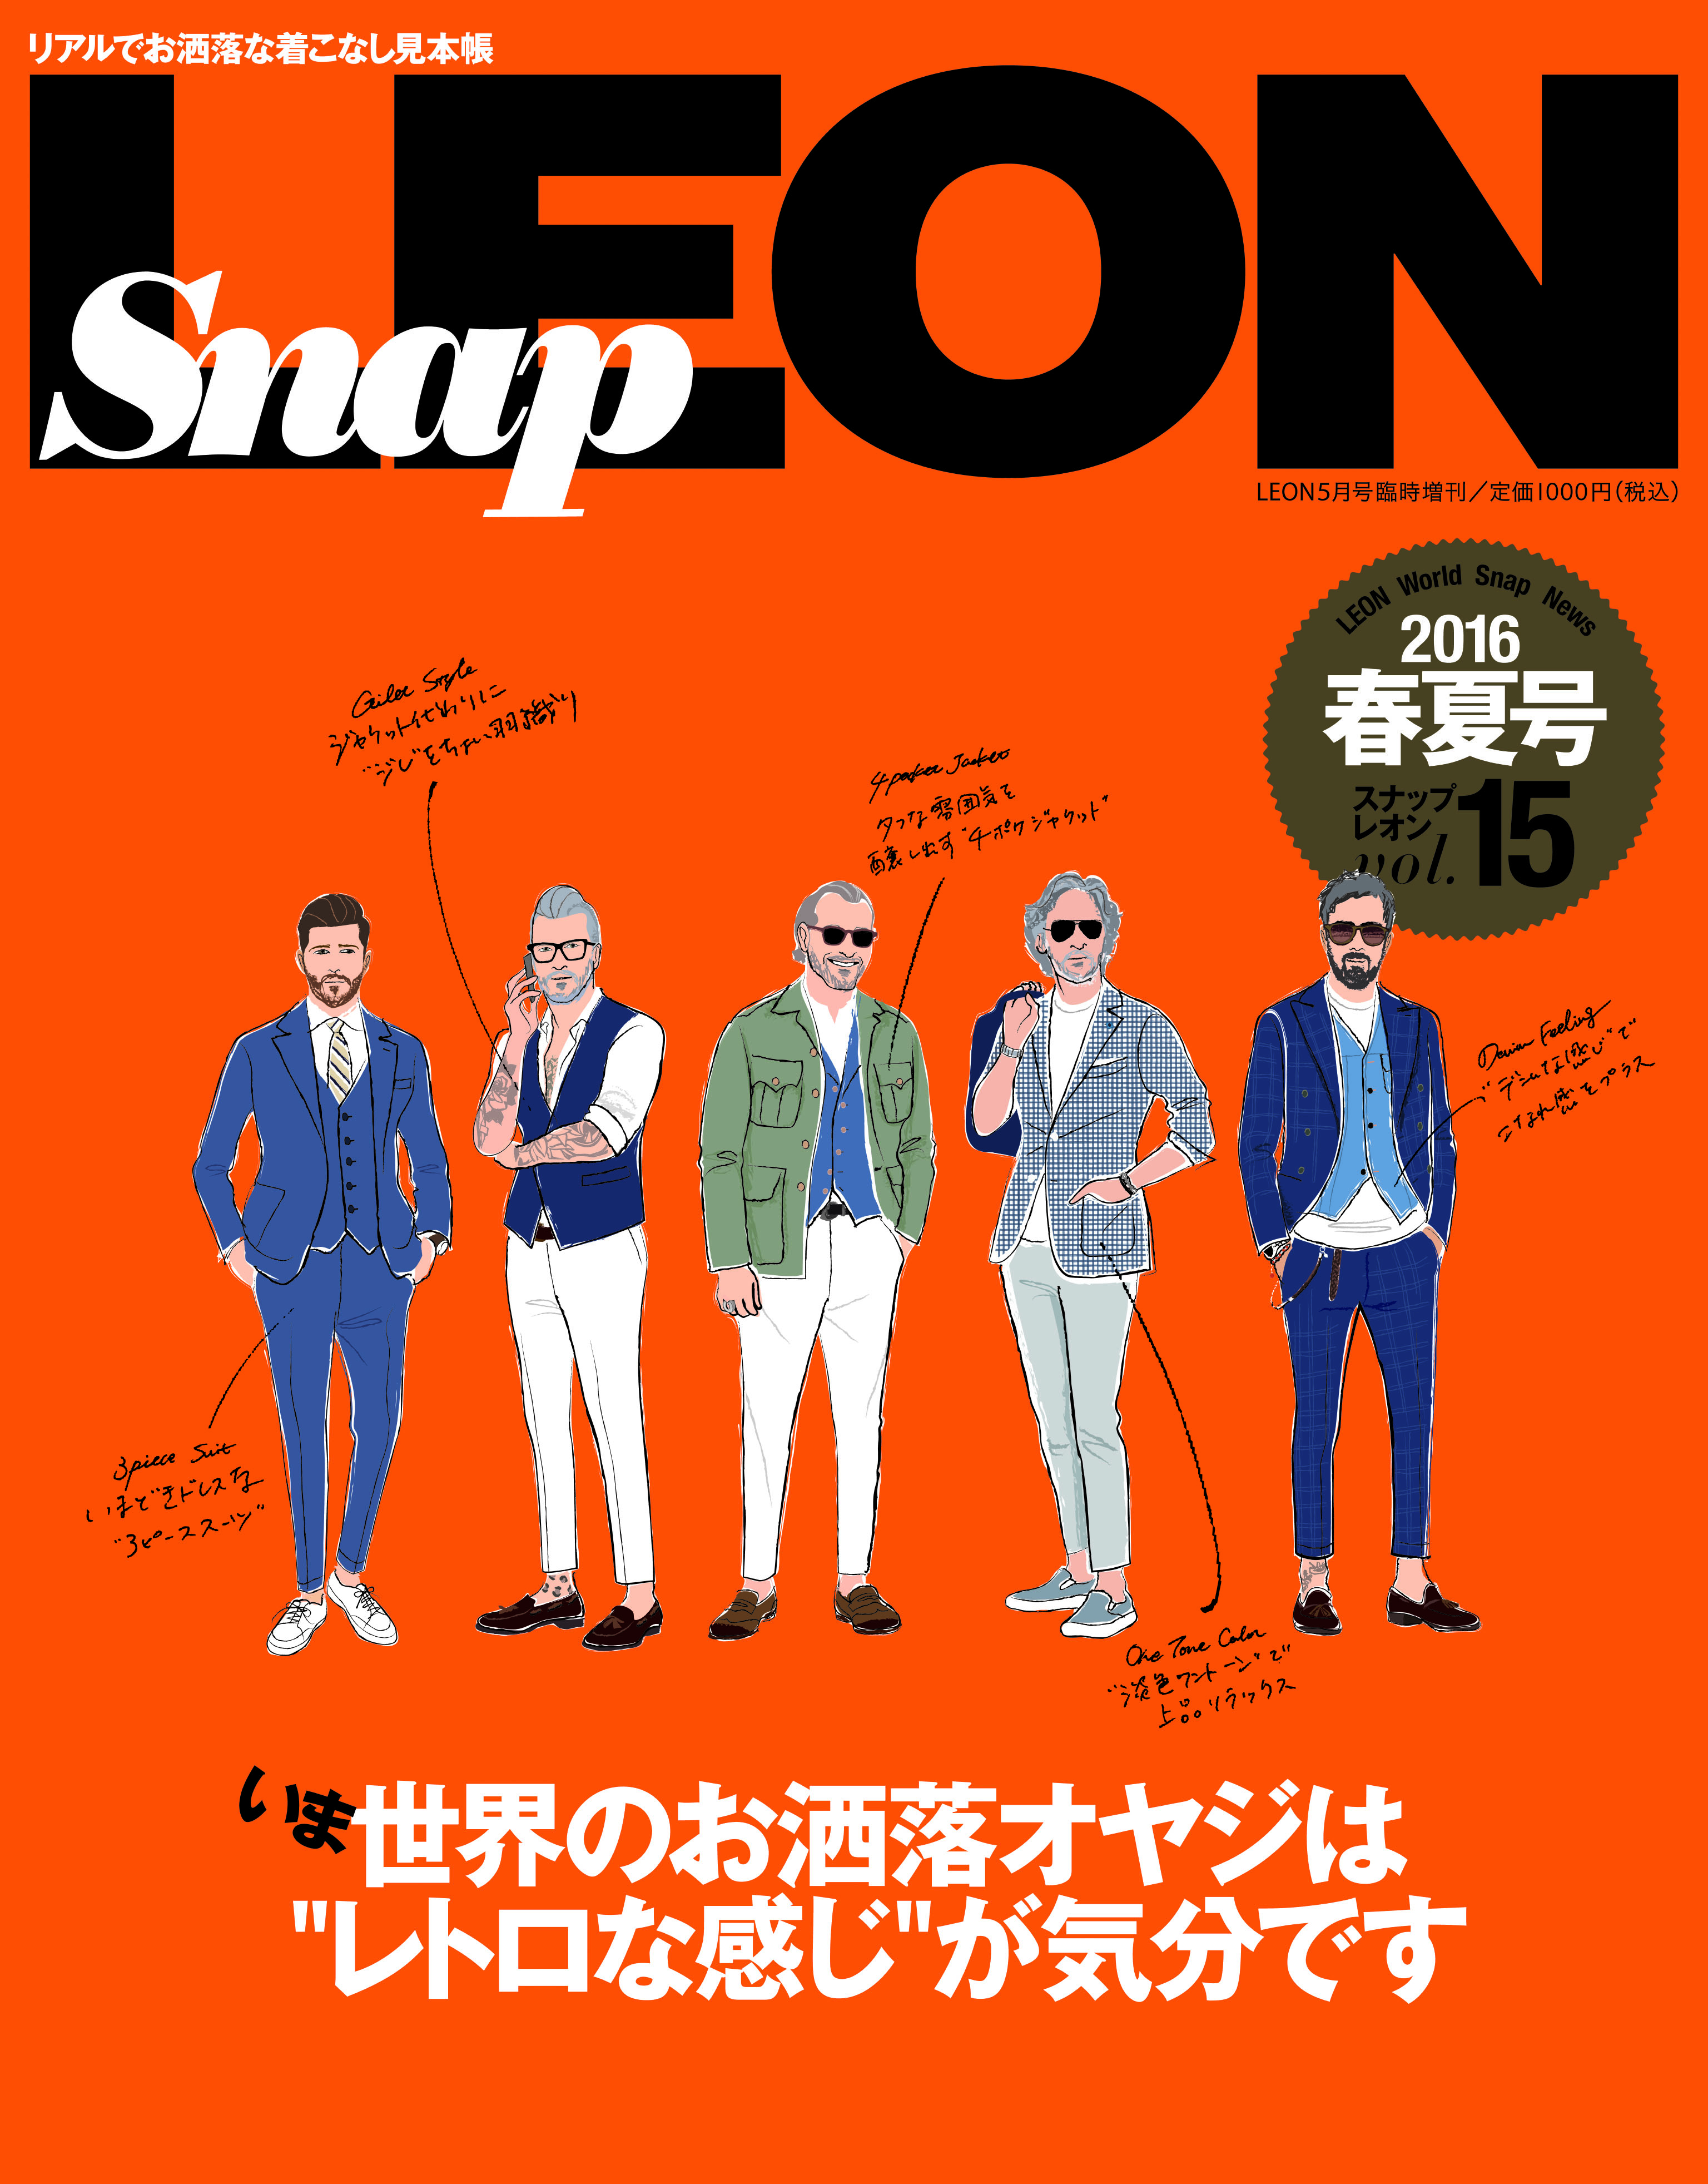 SnapLEON vol.15 H1-2